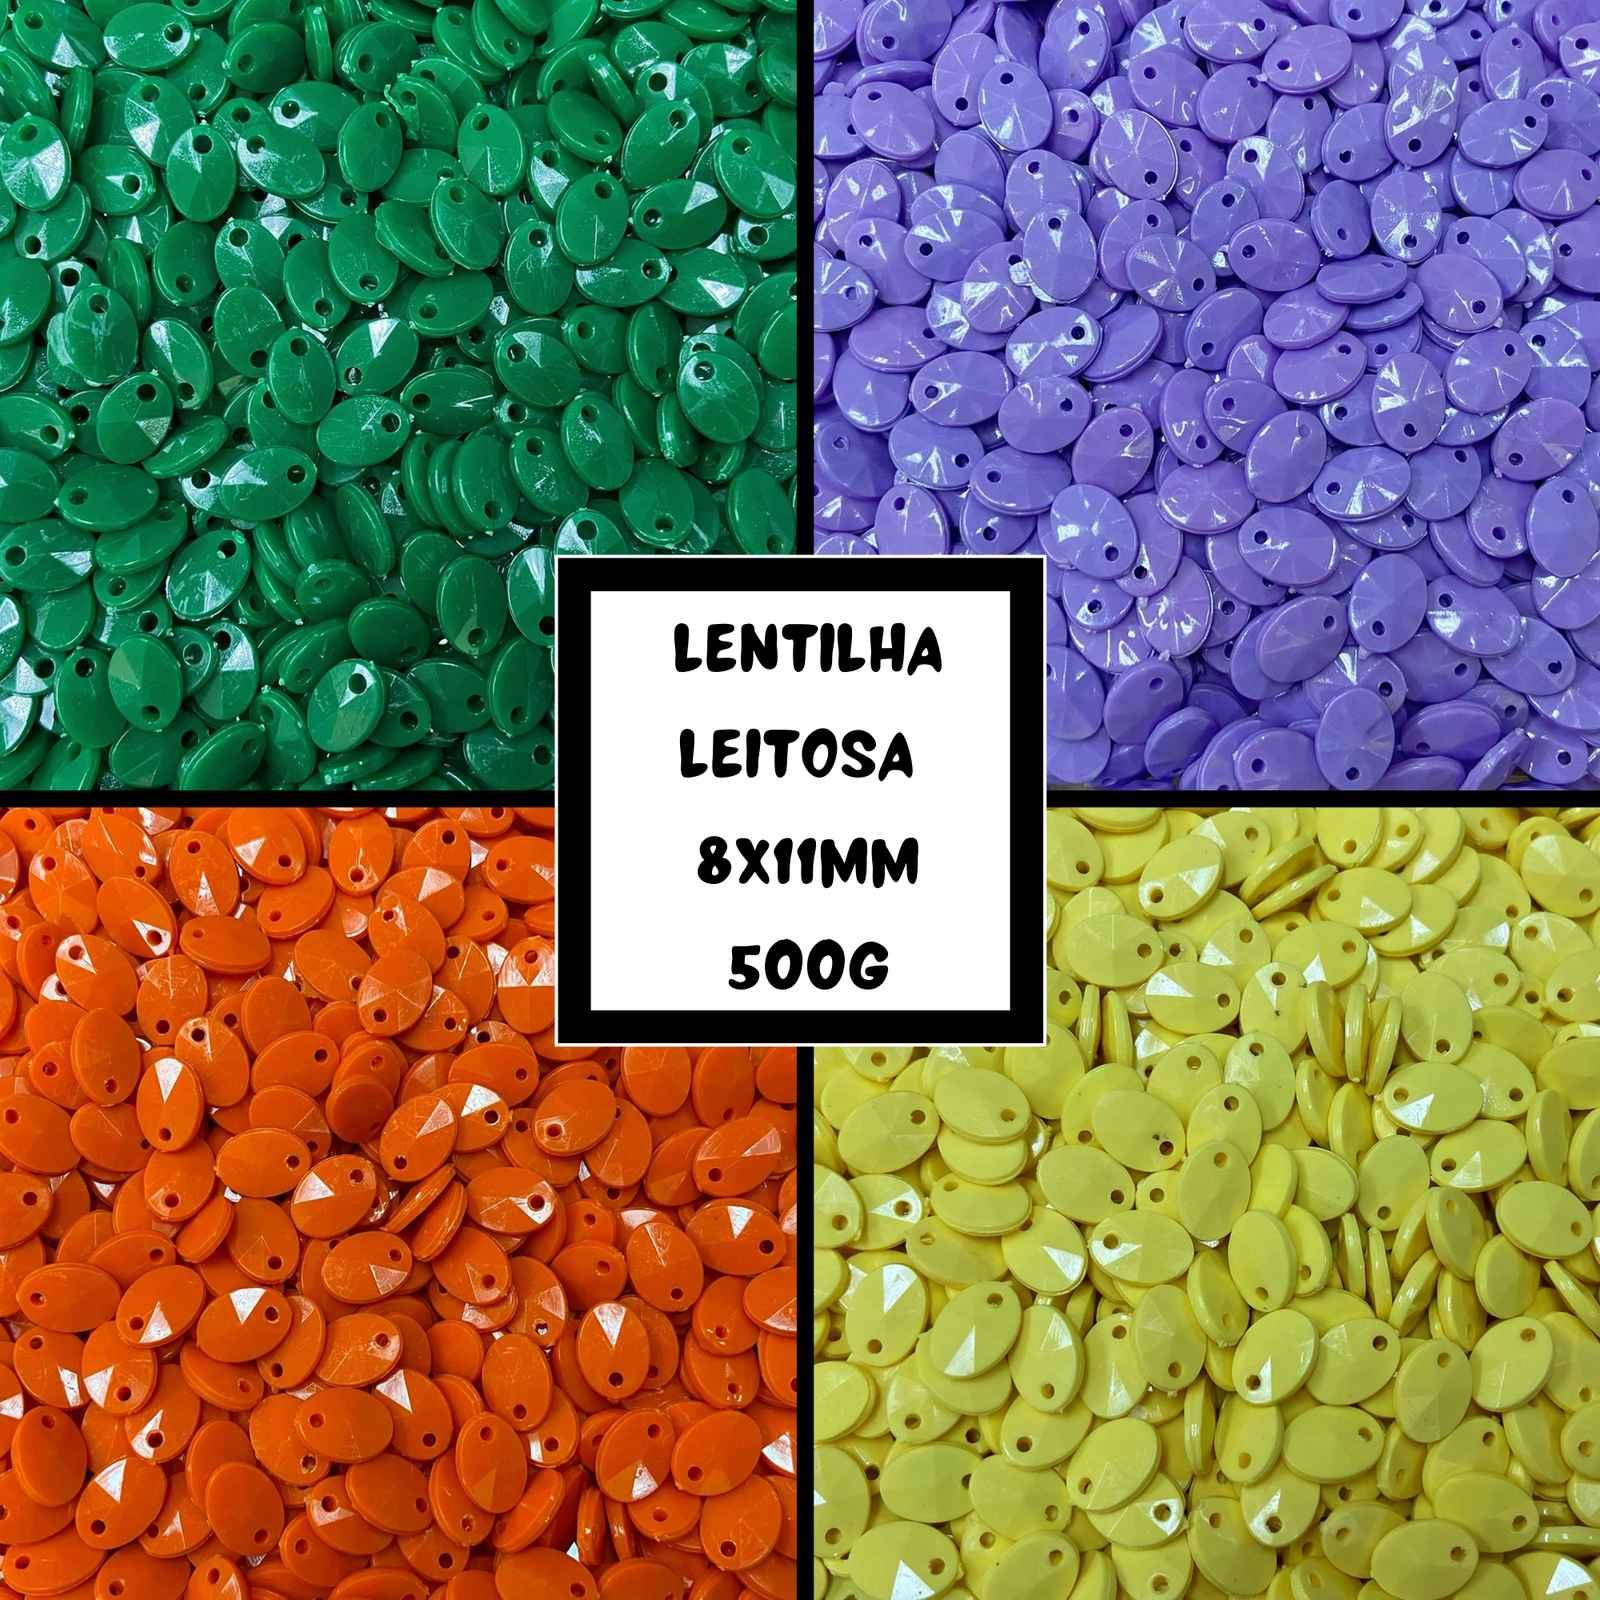 Lentilha Leitosa 8x11mm - 500g